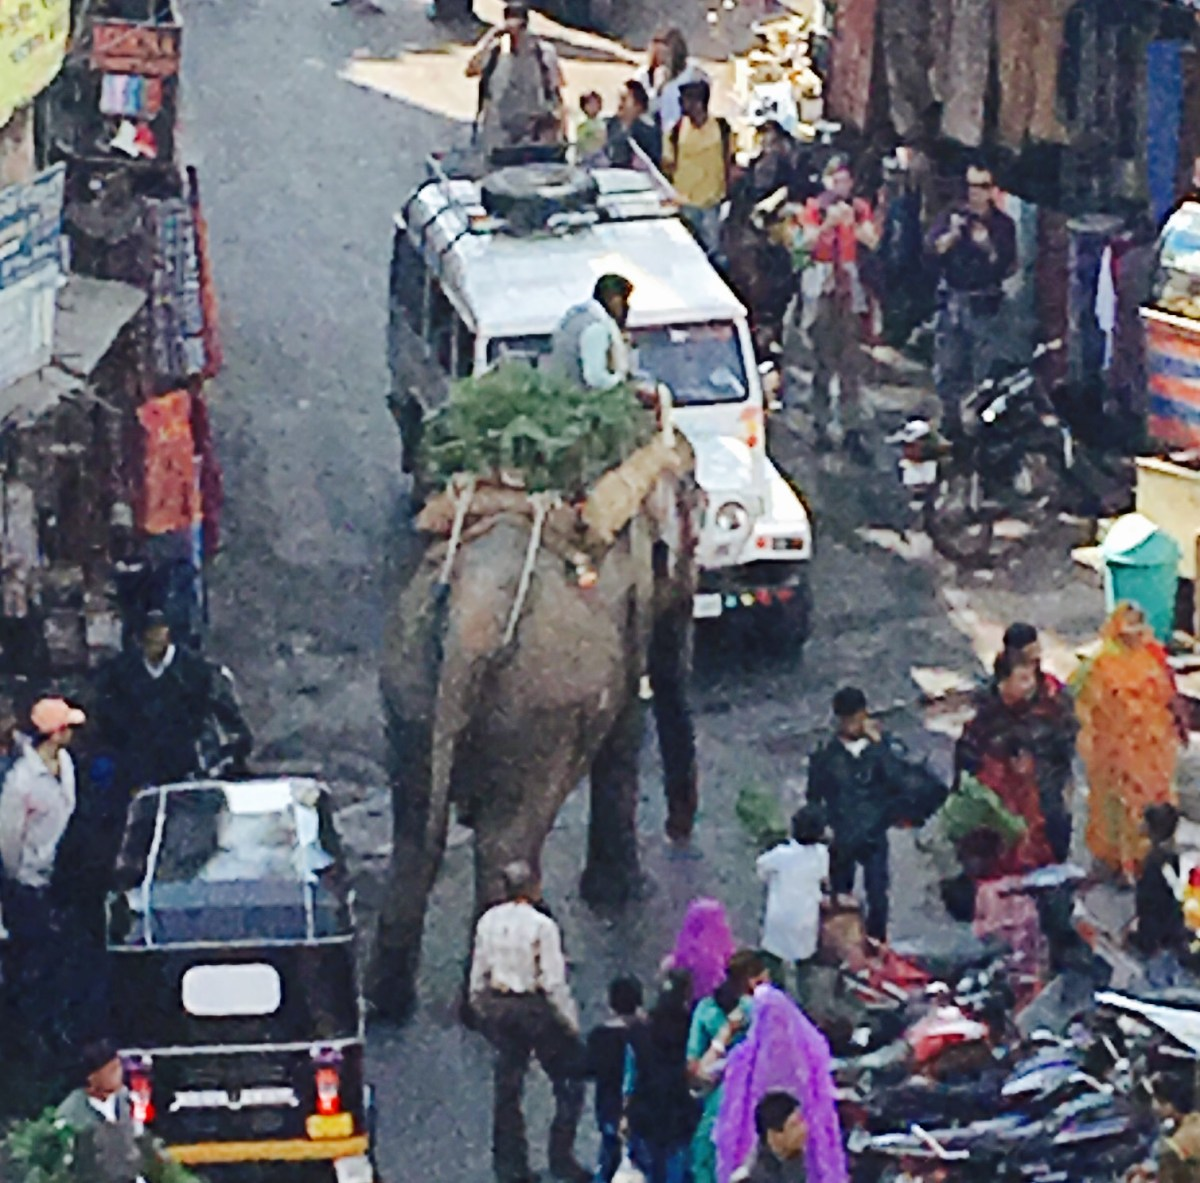 An elephant causing a traffic jam